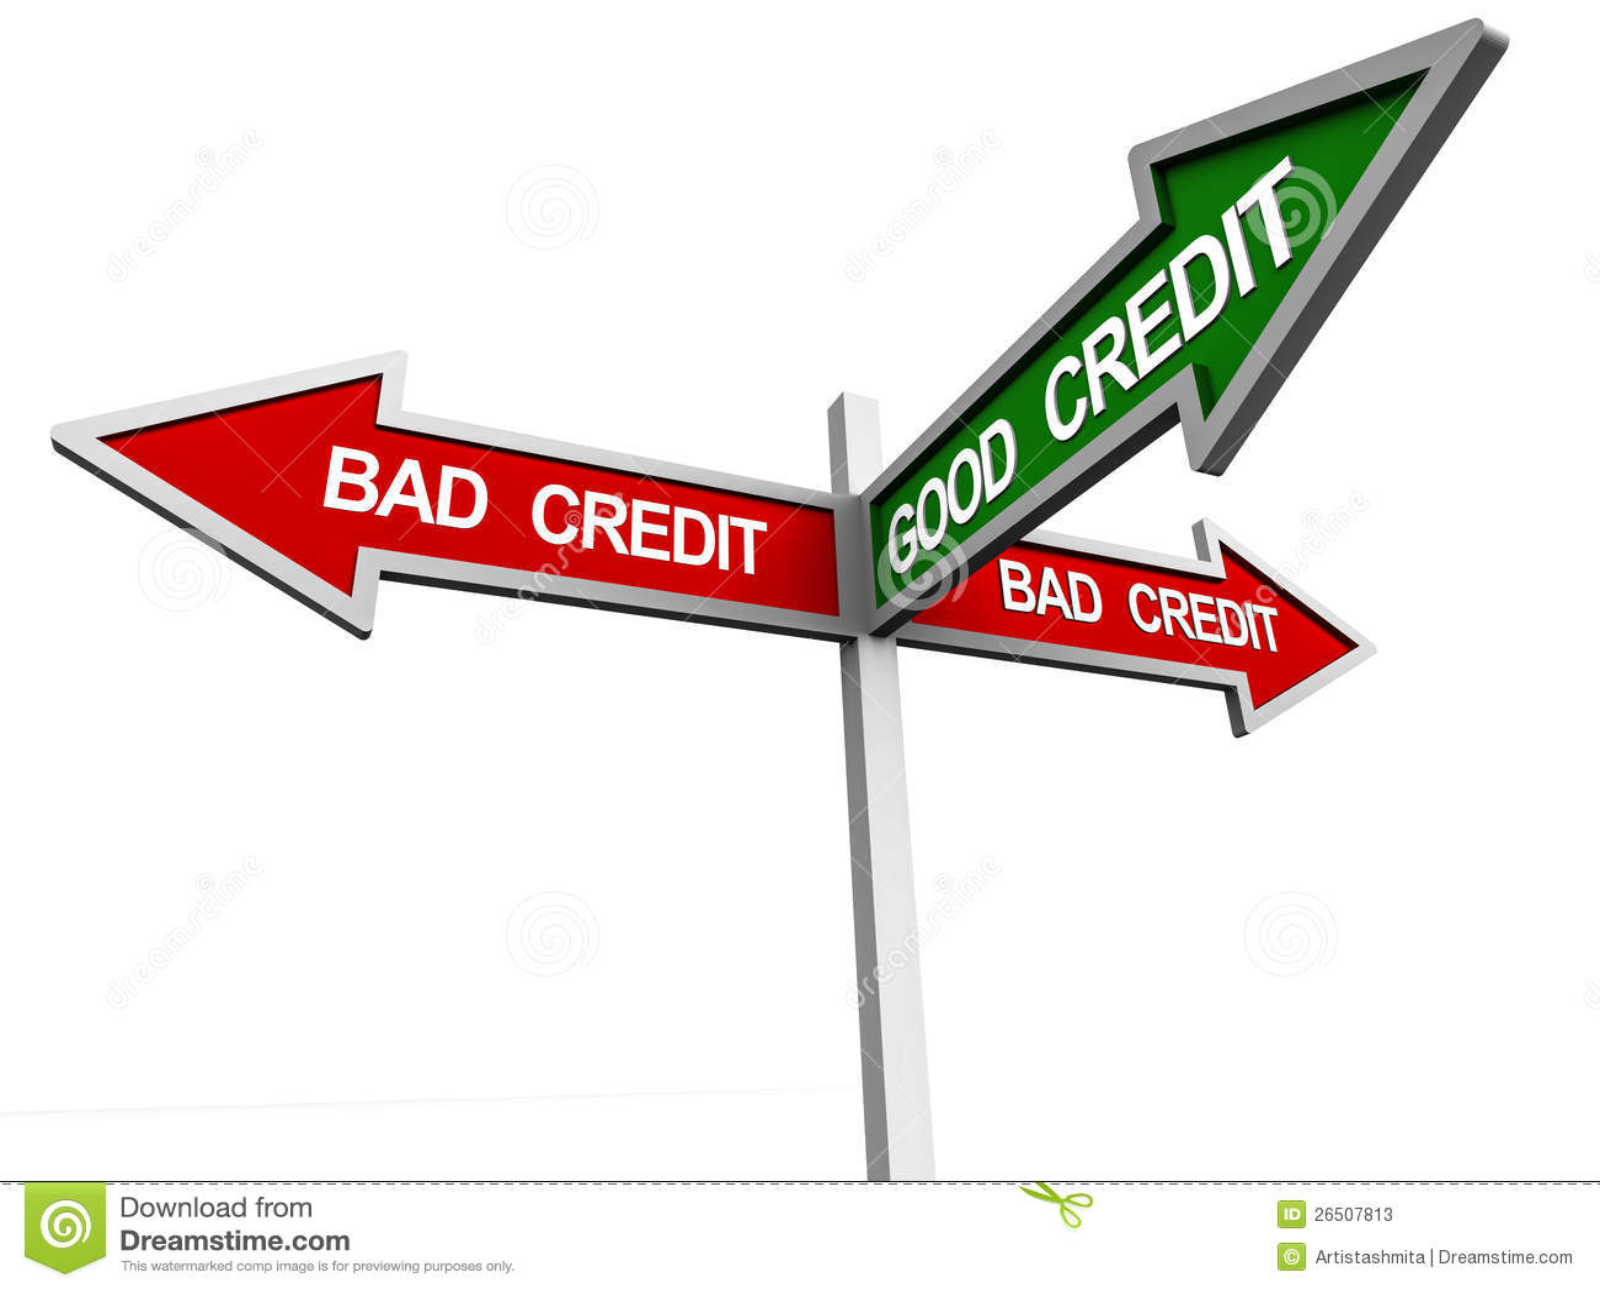 Good Vs Bad Credit - Two-Way Street Sign Royalty-Free ...